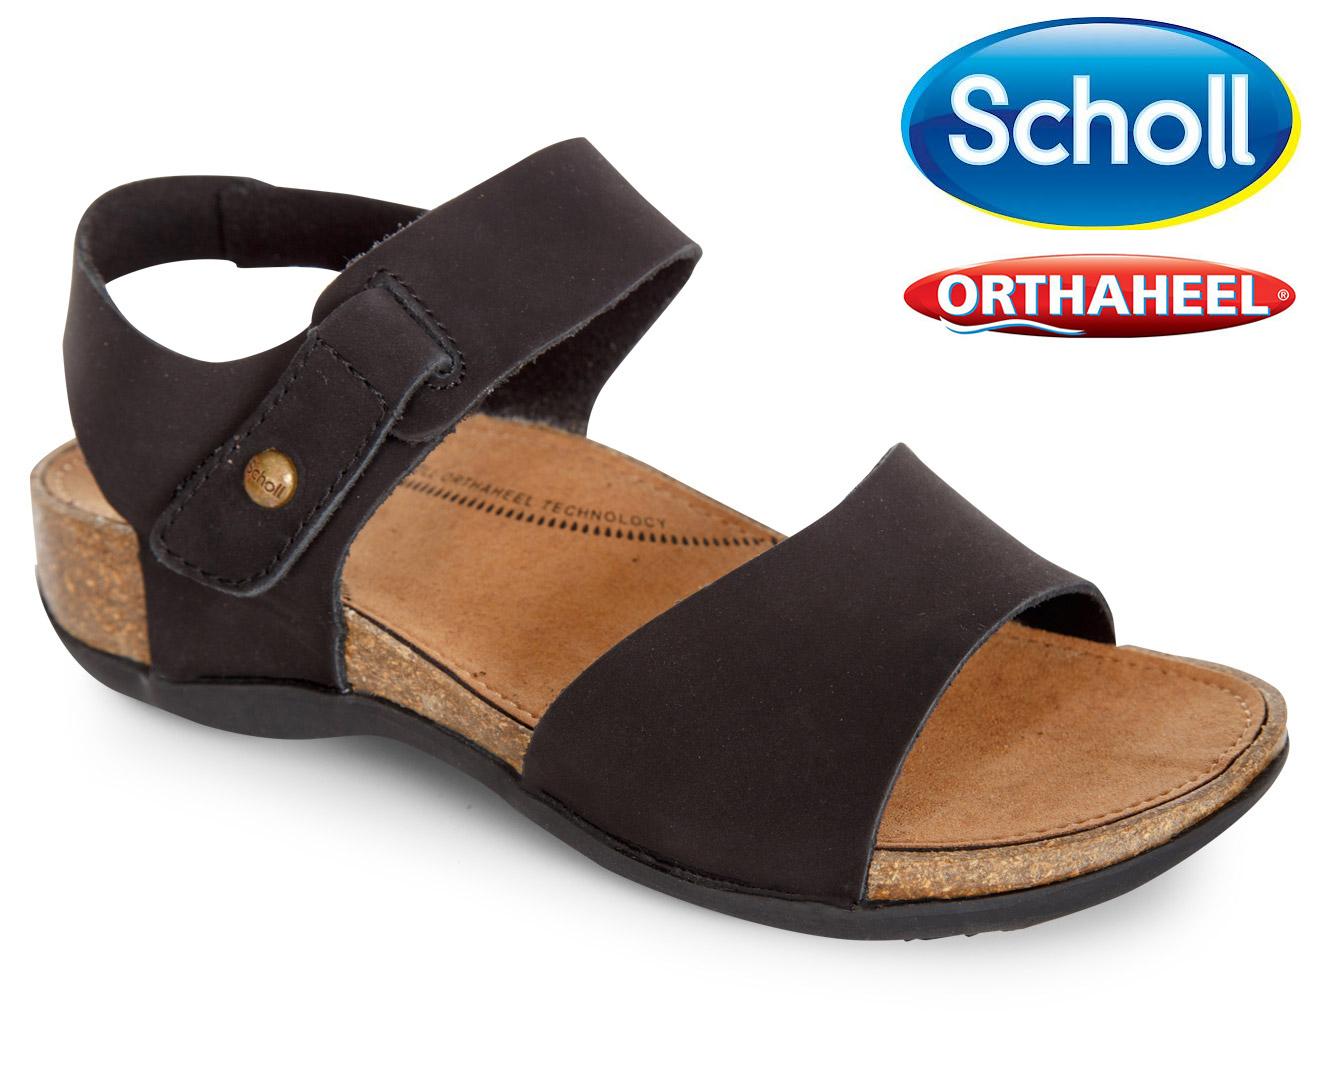 Devonport Orthaheel Sandals - Black